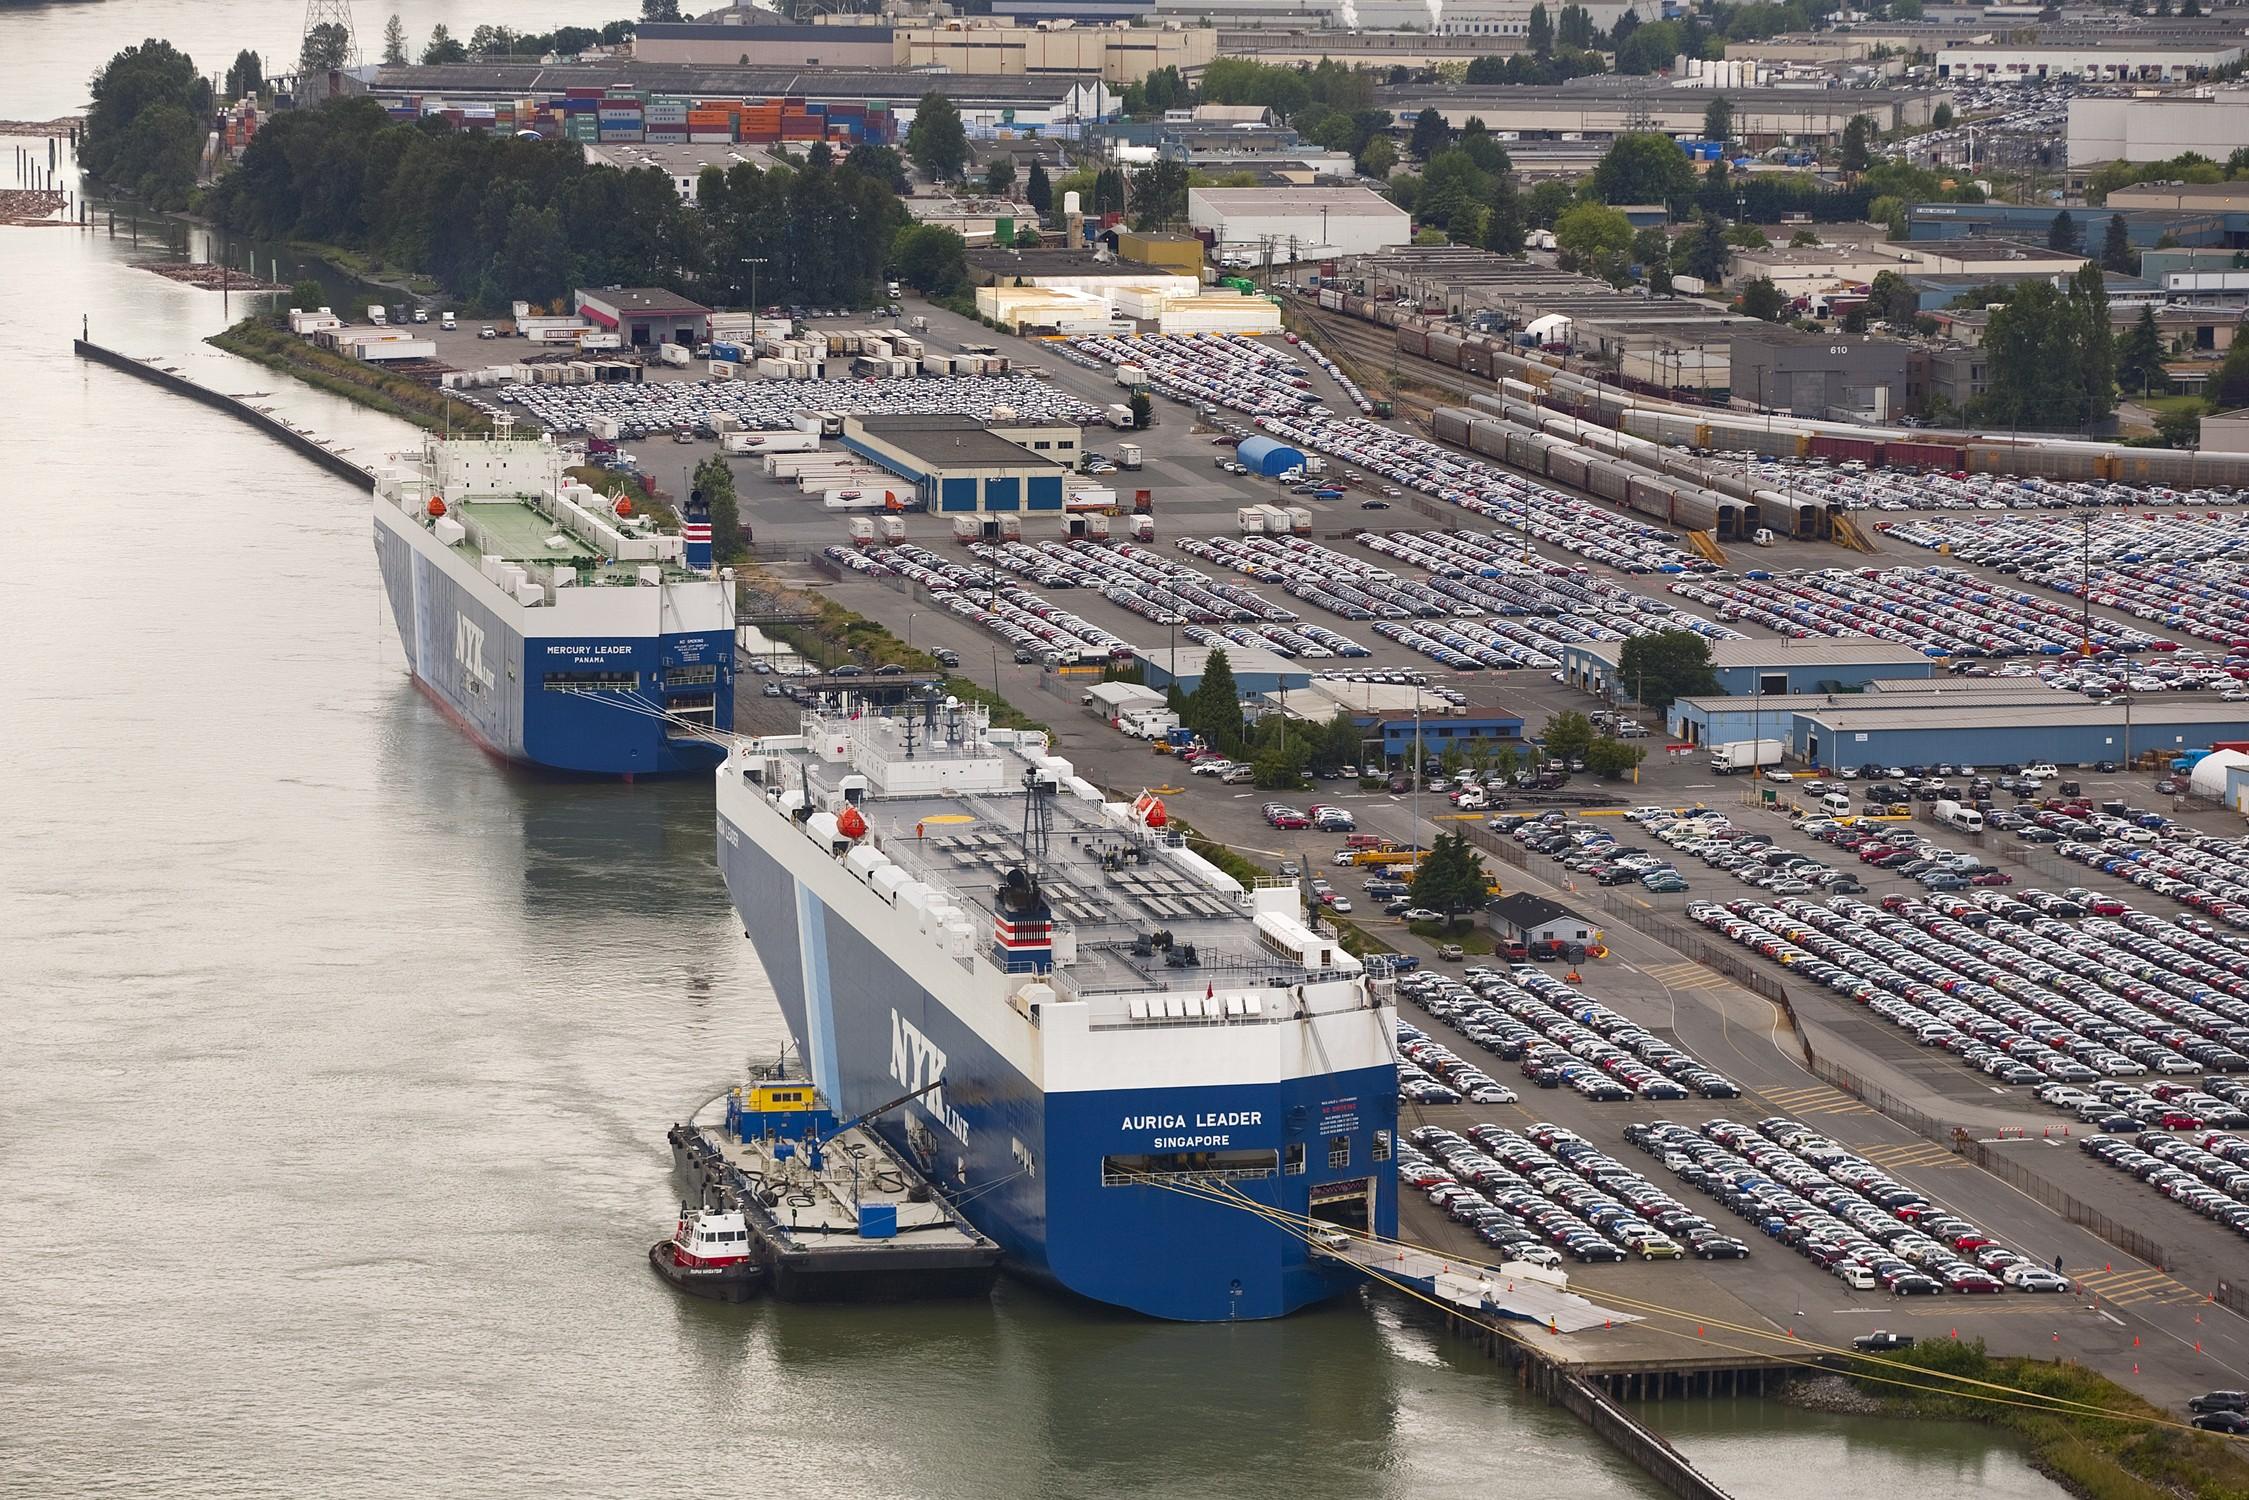 LNR Carriers   LNR Logistics   LinkedIn